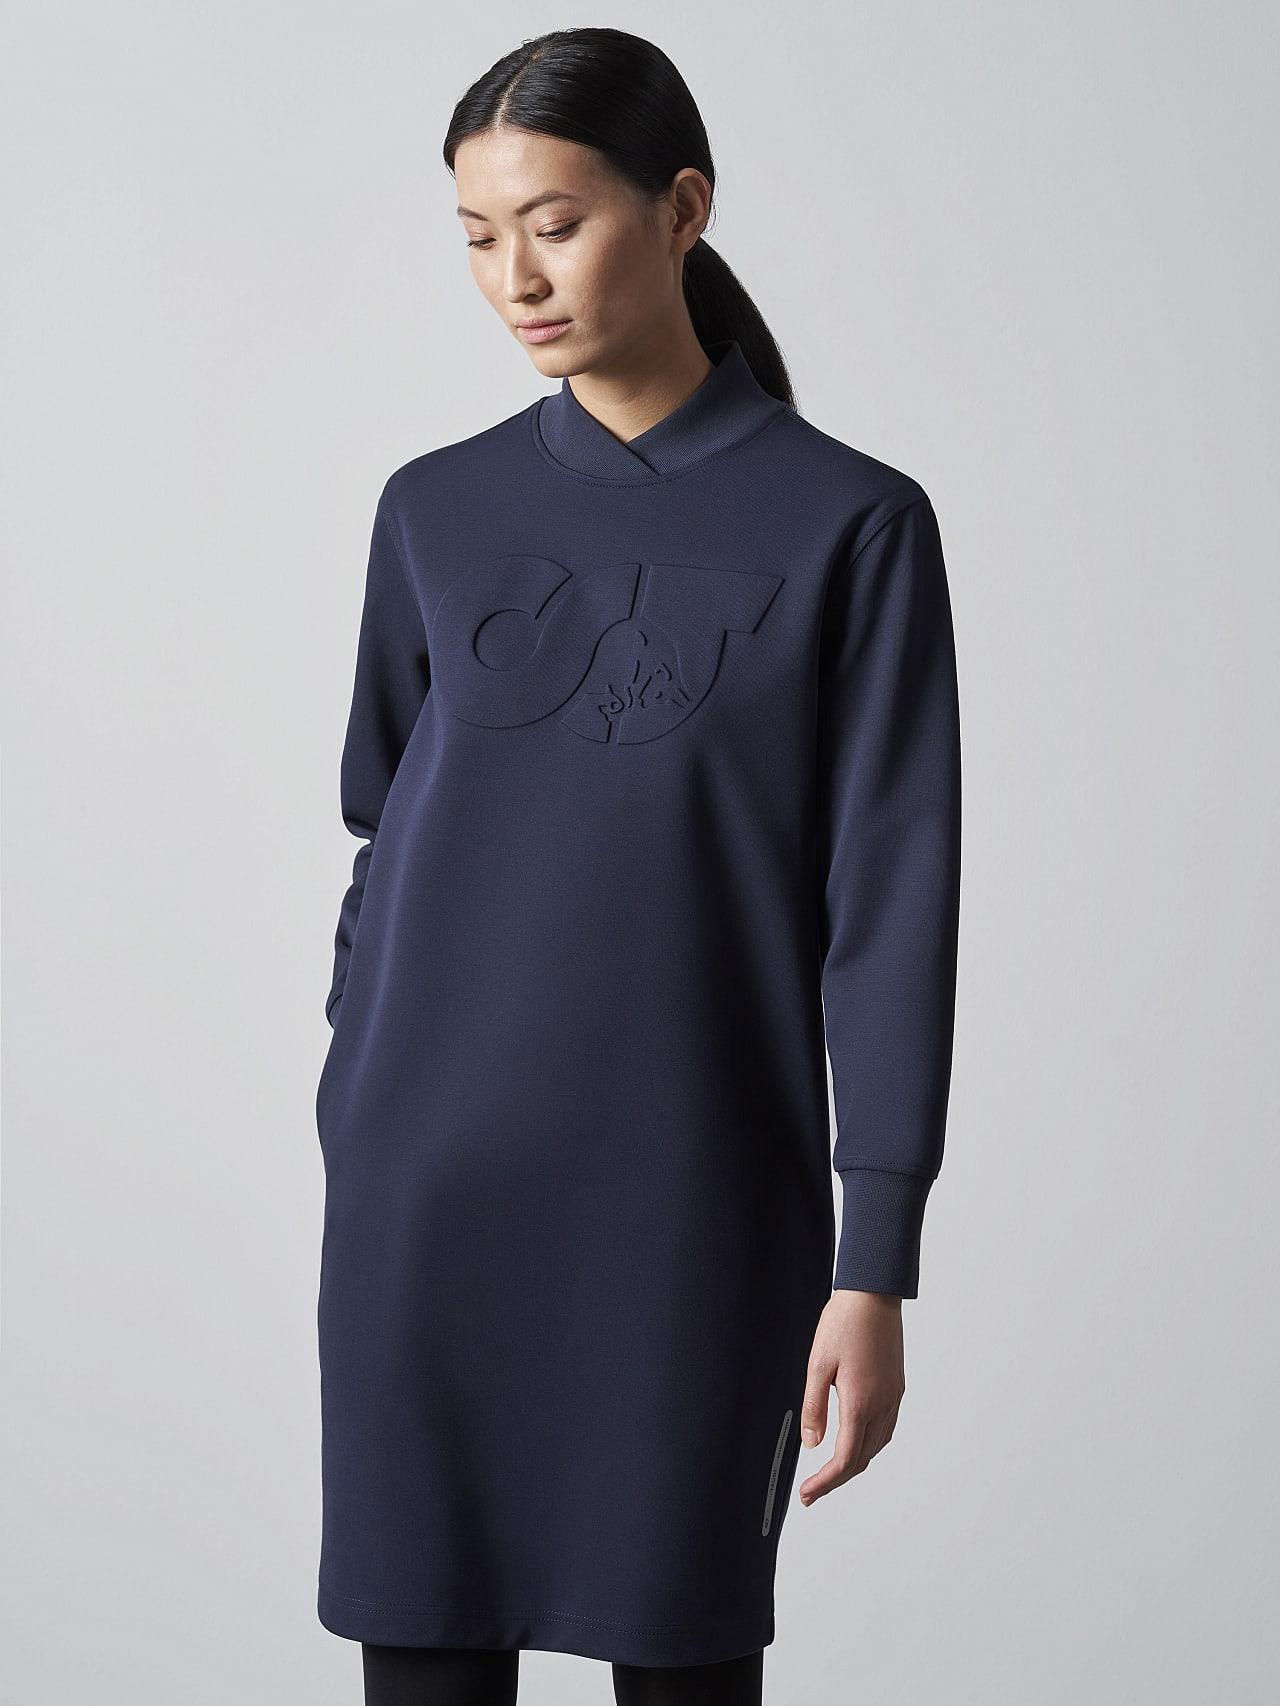 STAR V3.Y5.02 Premium Logo Sweater Dress navy Model shot Alpha Tauri